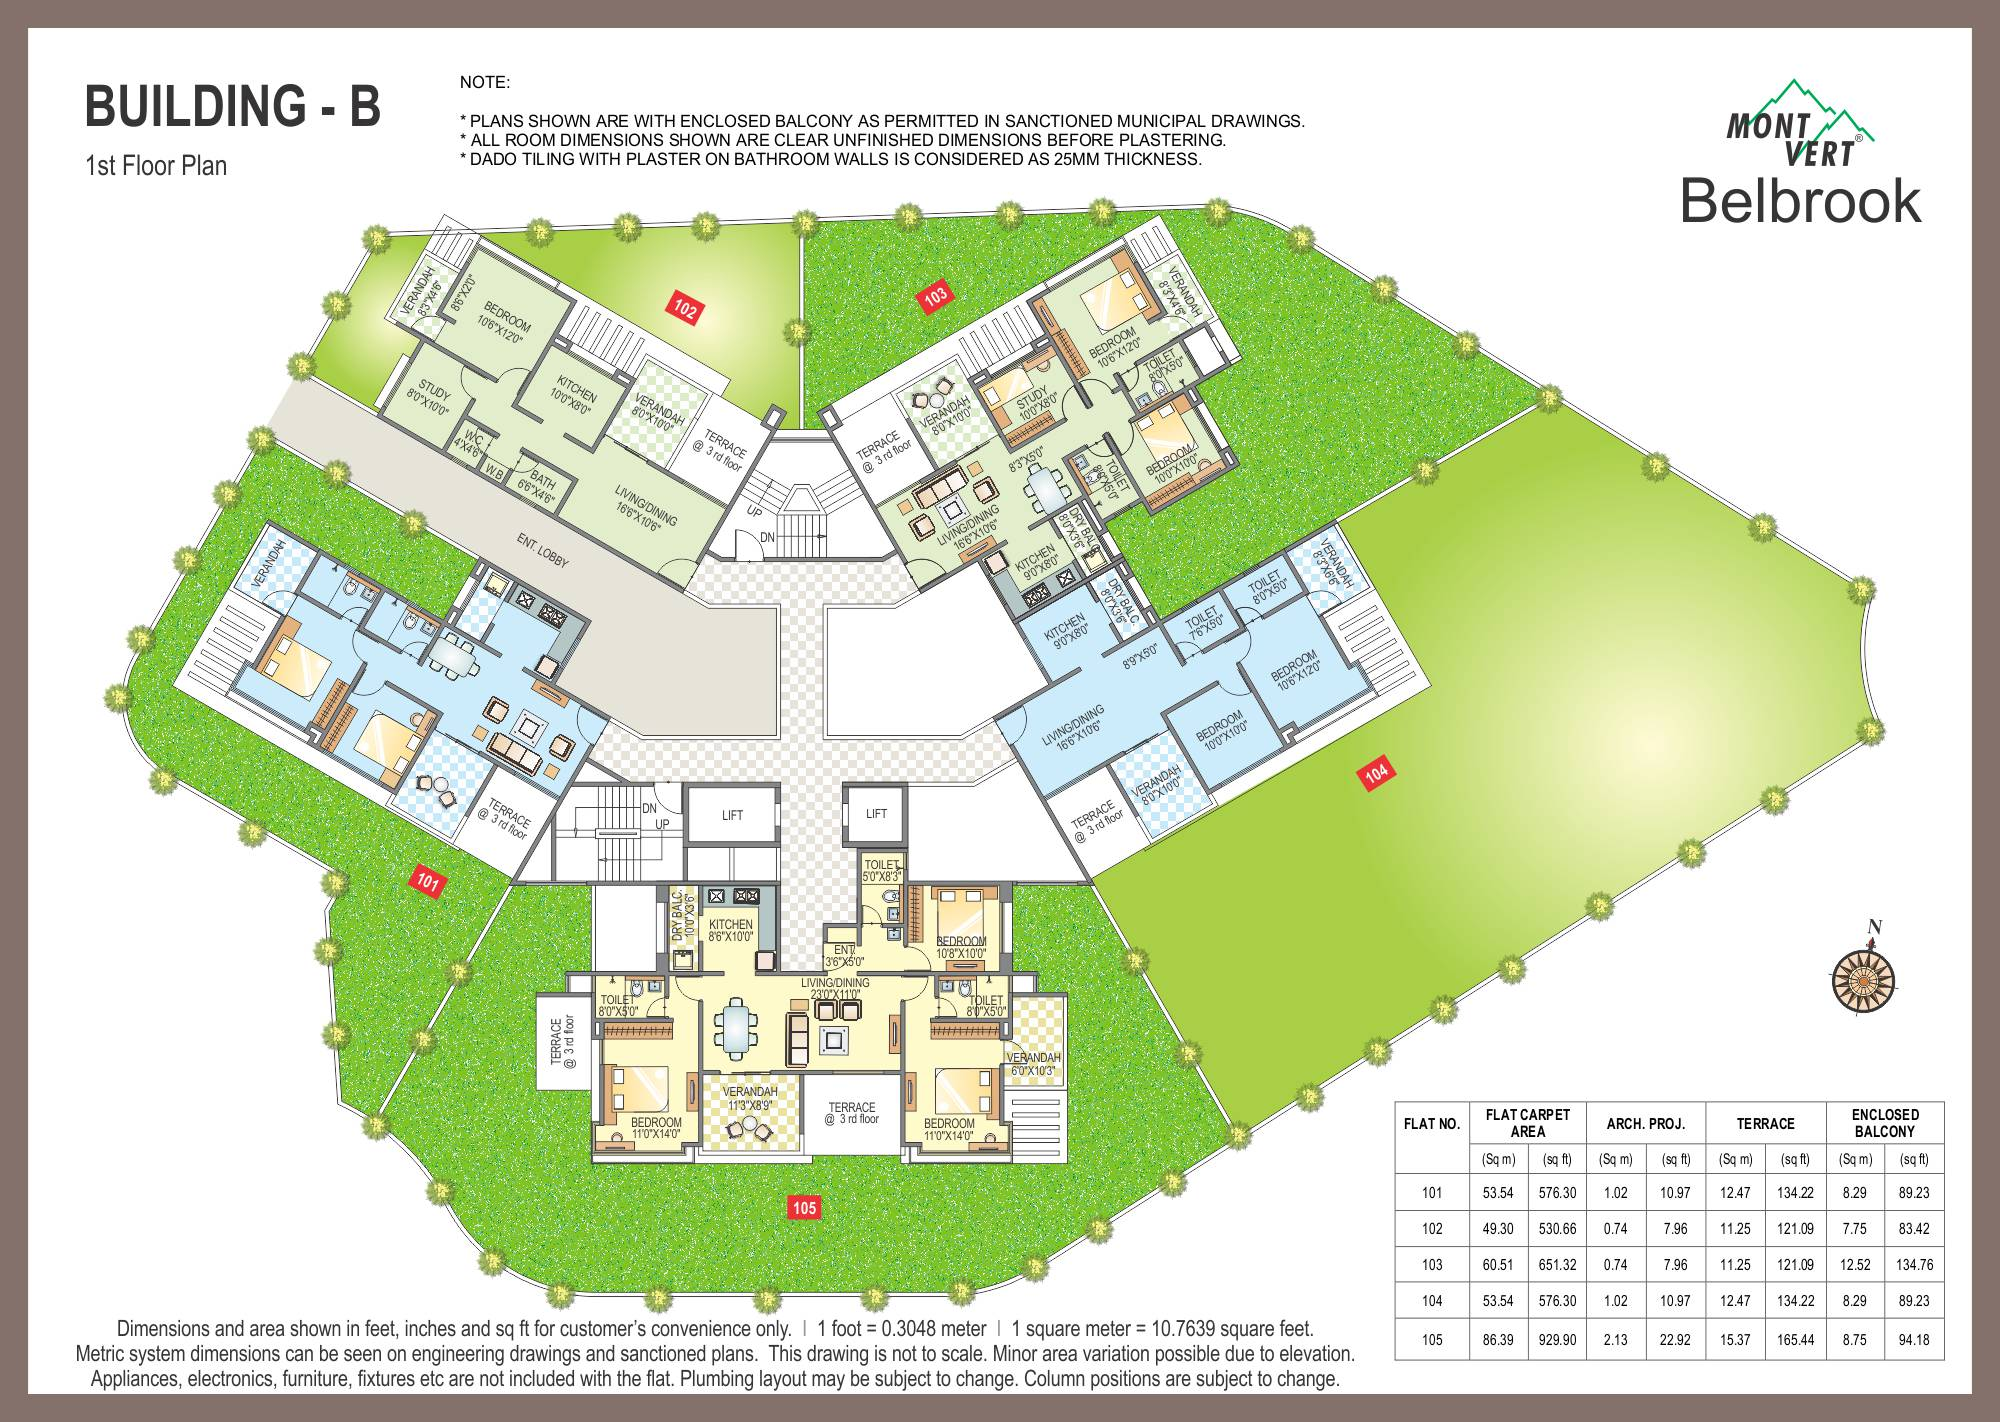 2 BHK Flats In Bhugaon Mont Vert Belbrook B 1st P